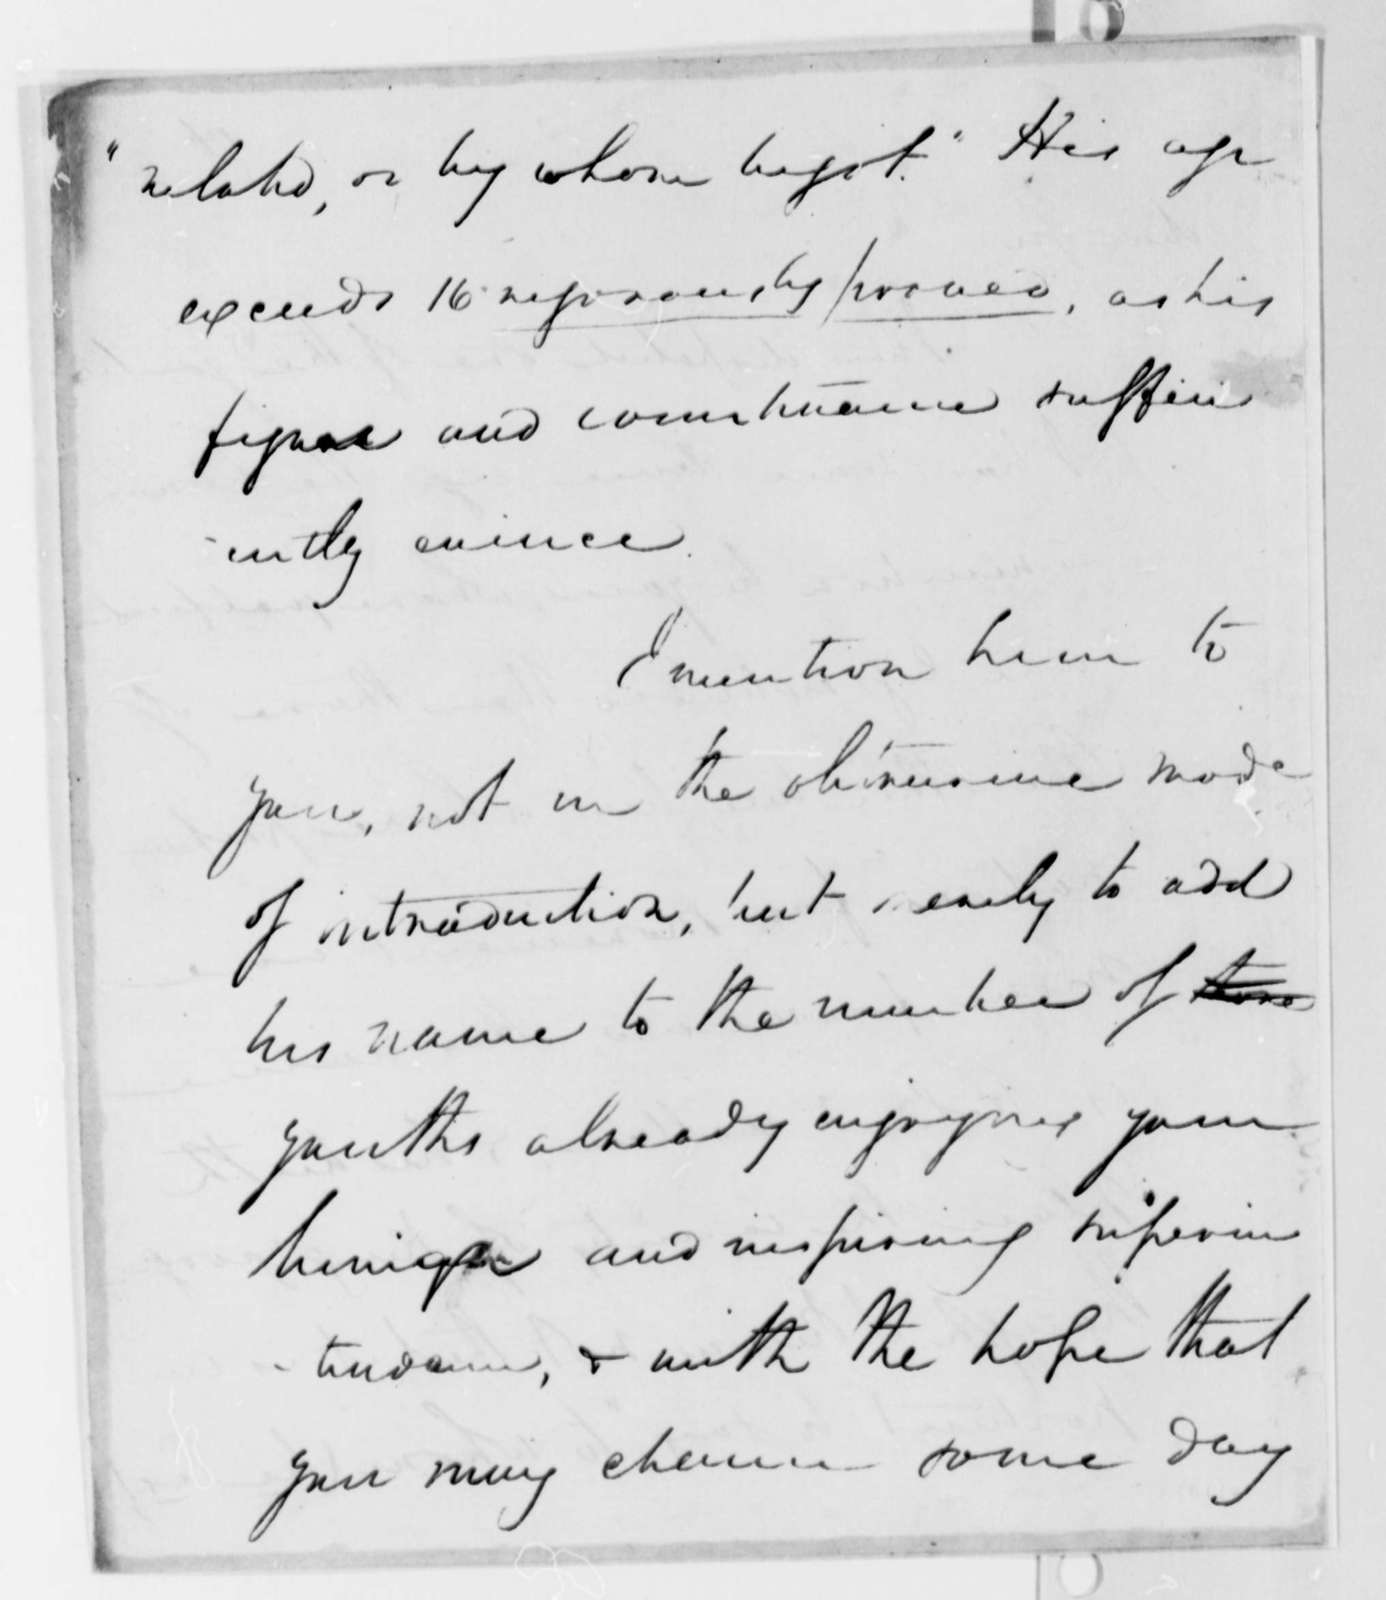 Henry Lee, Jr. to Thomas Jefferson, July 28, 1825